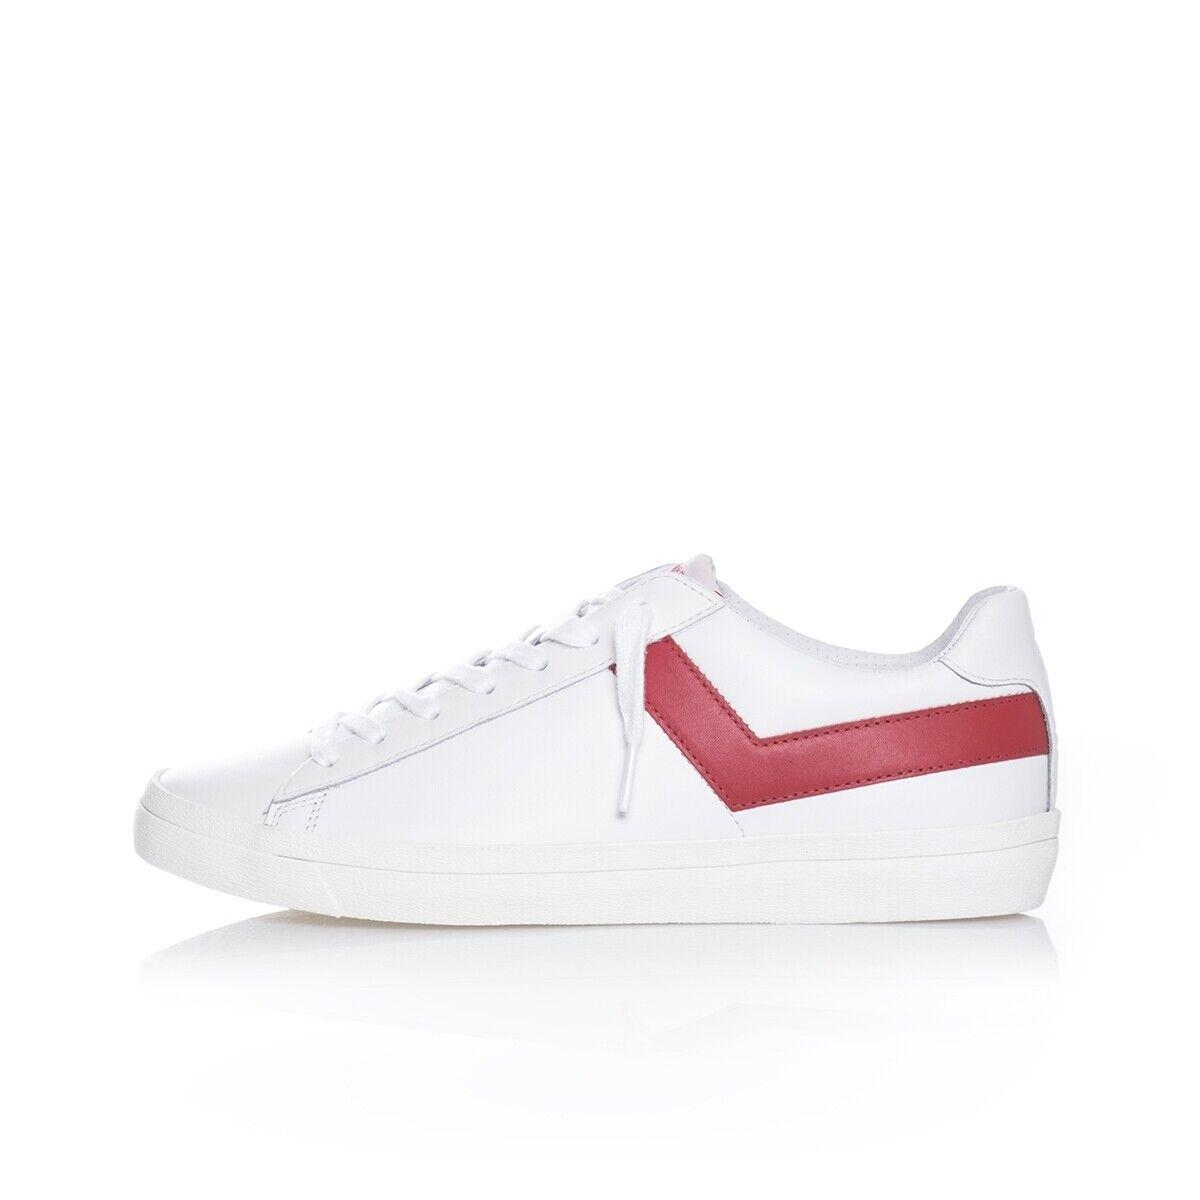 zapatos hombres PONY TOP STAR 634A.DK4